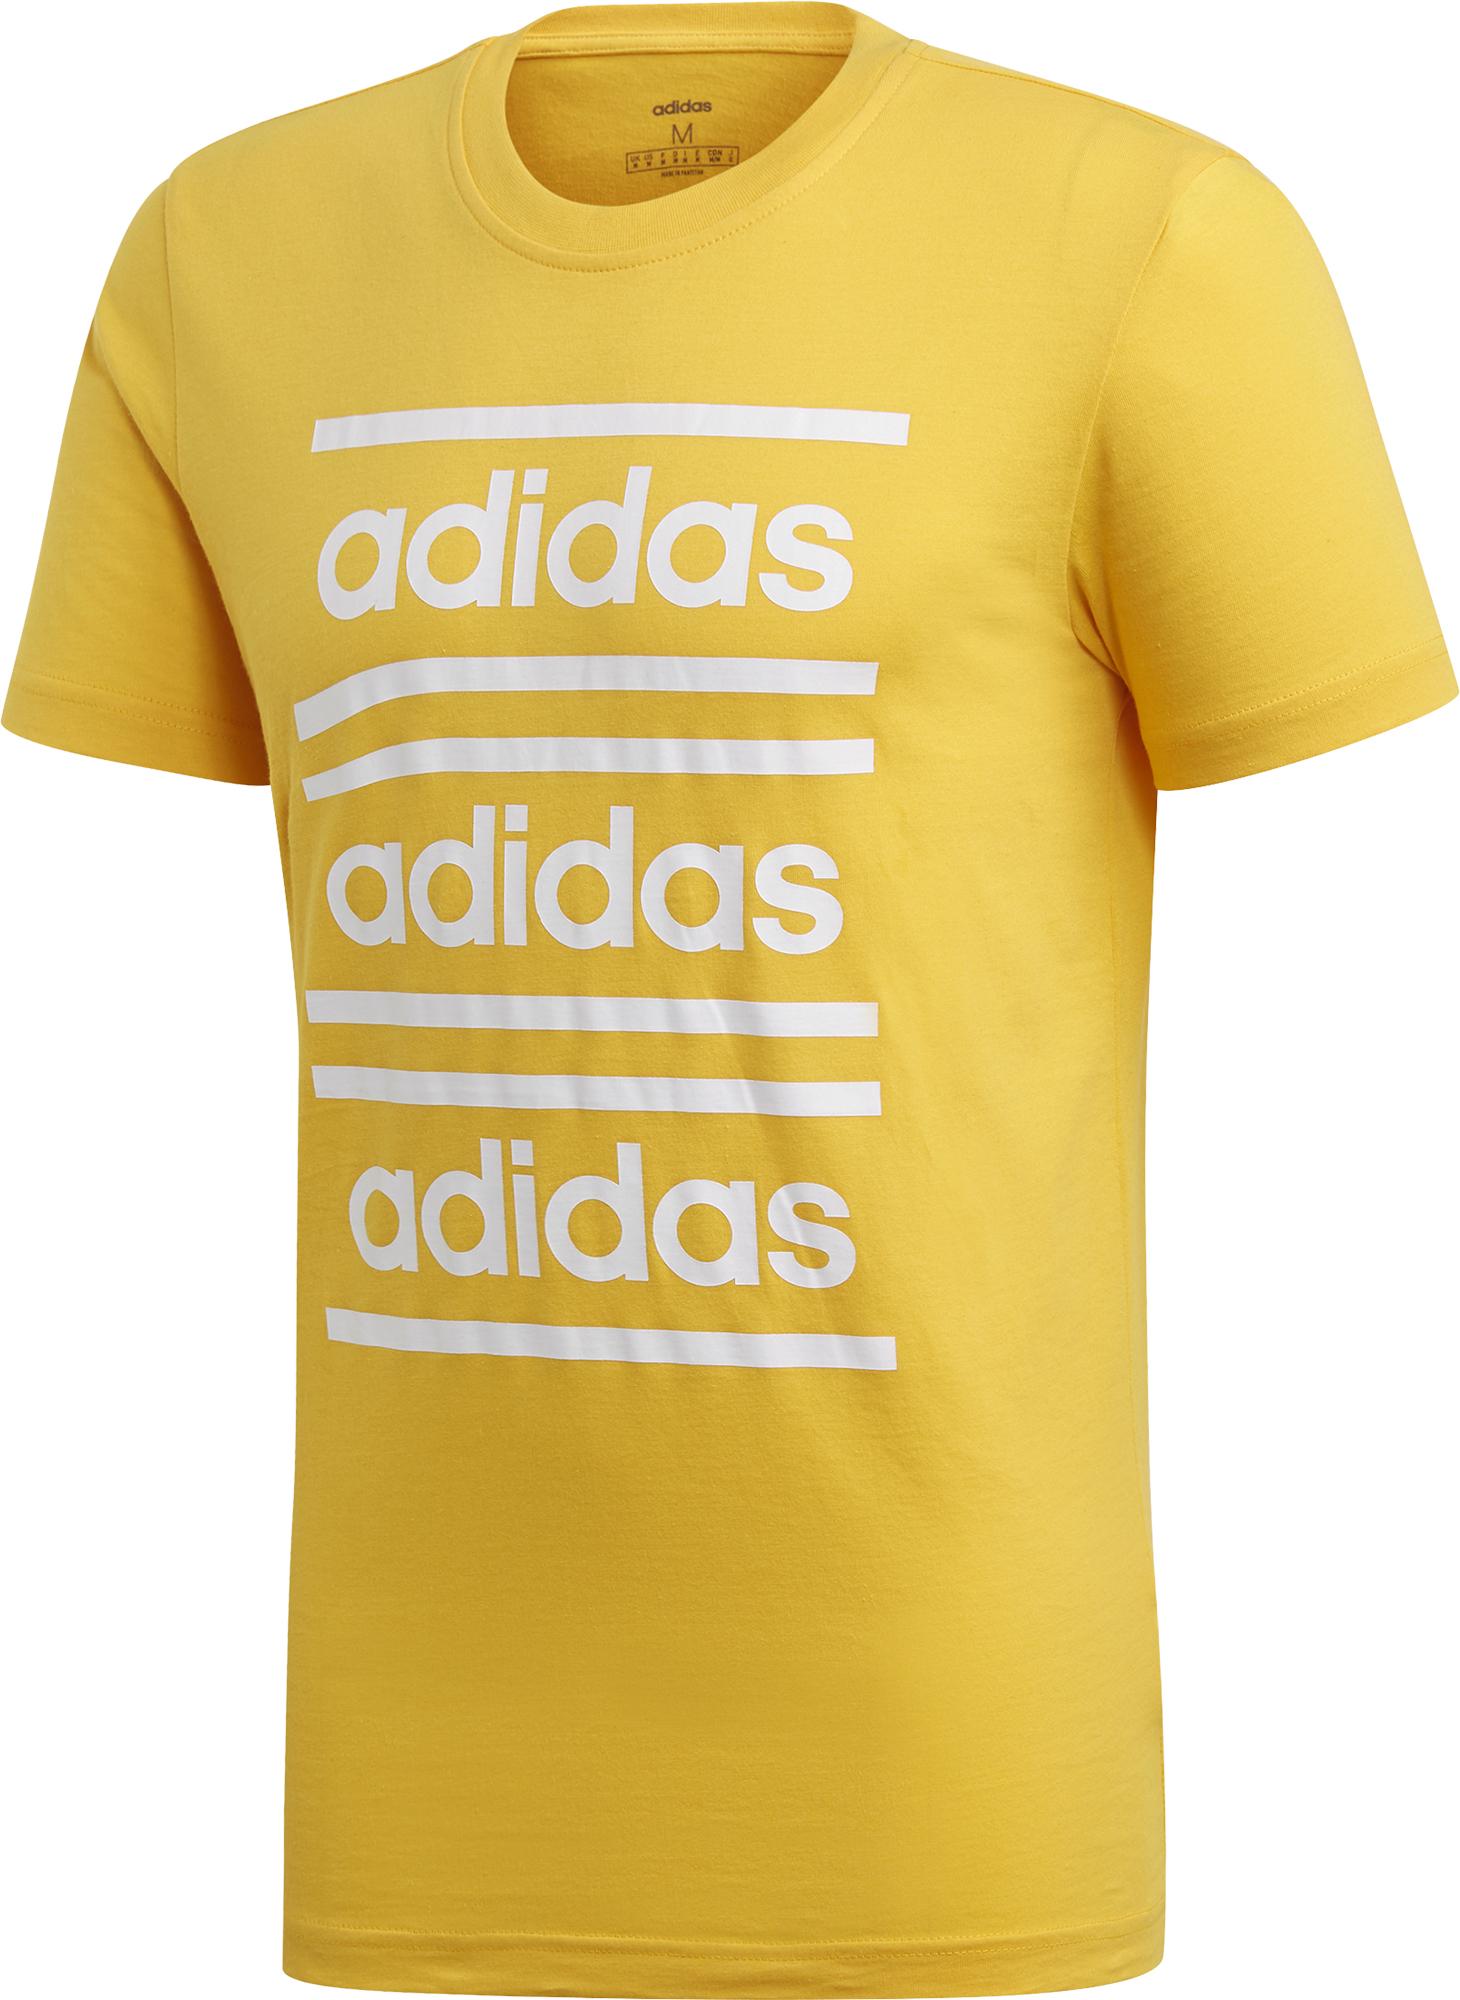 Adidas Футболка мужская Celebrate the 90s, размер 52